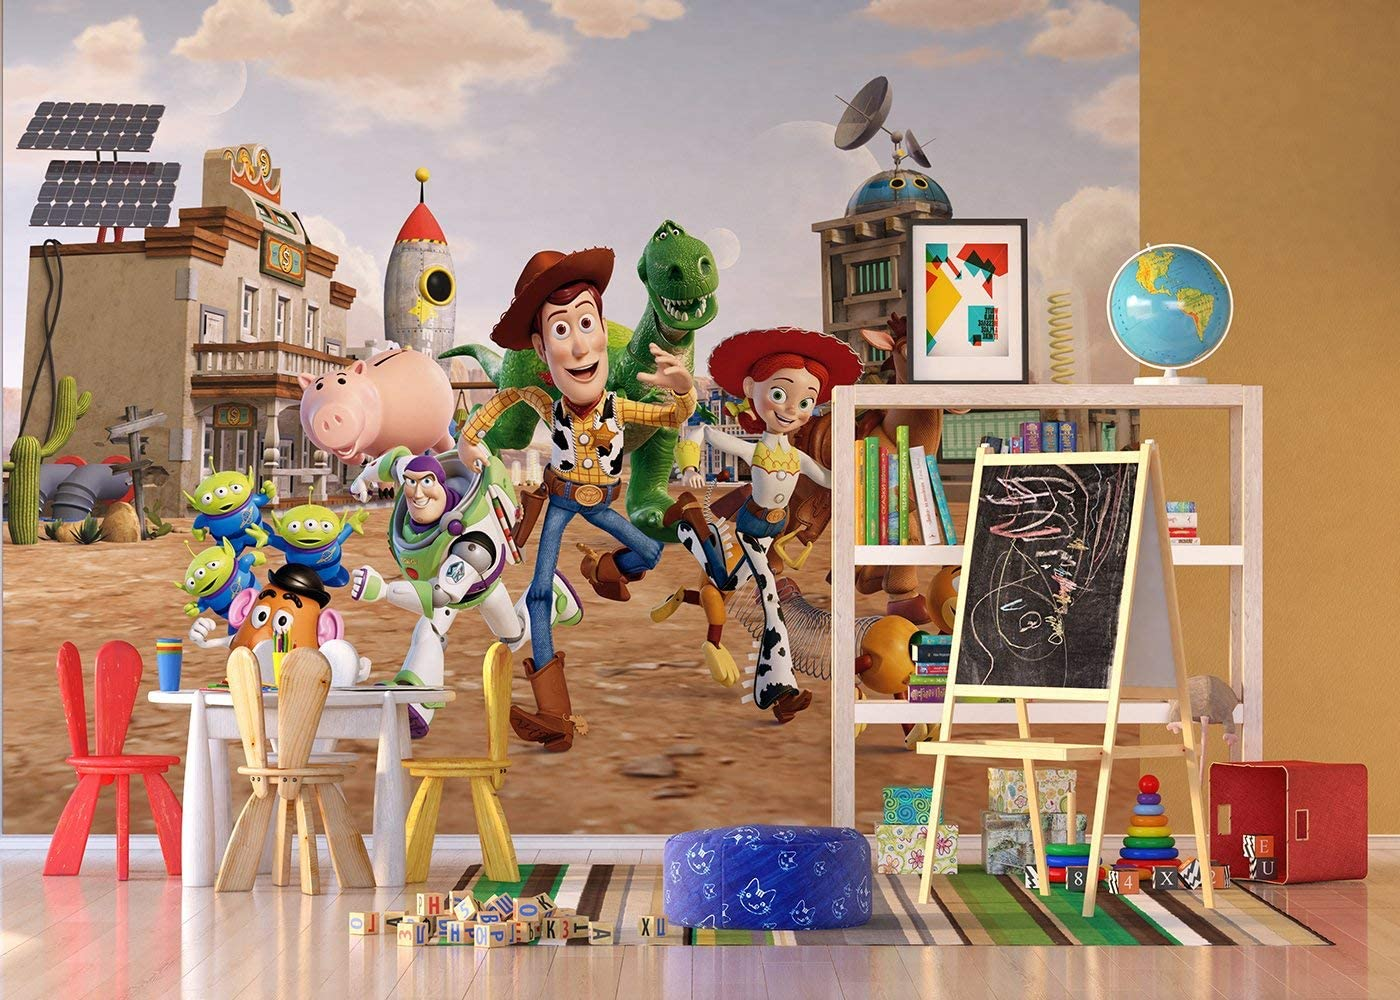 Disney Toy Story Wallpaper Xxl Amazon Co Uk Kitchen Home